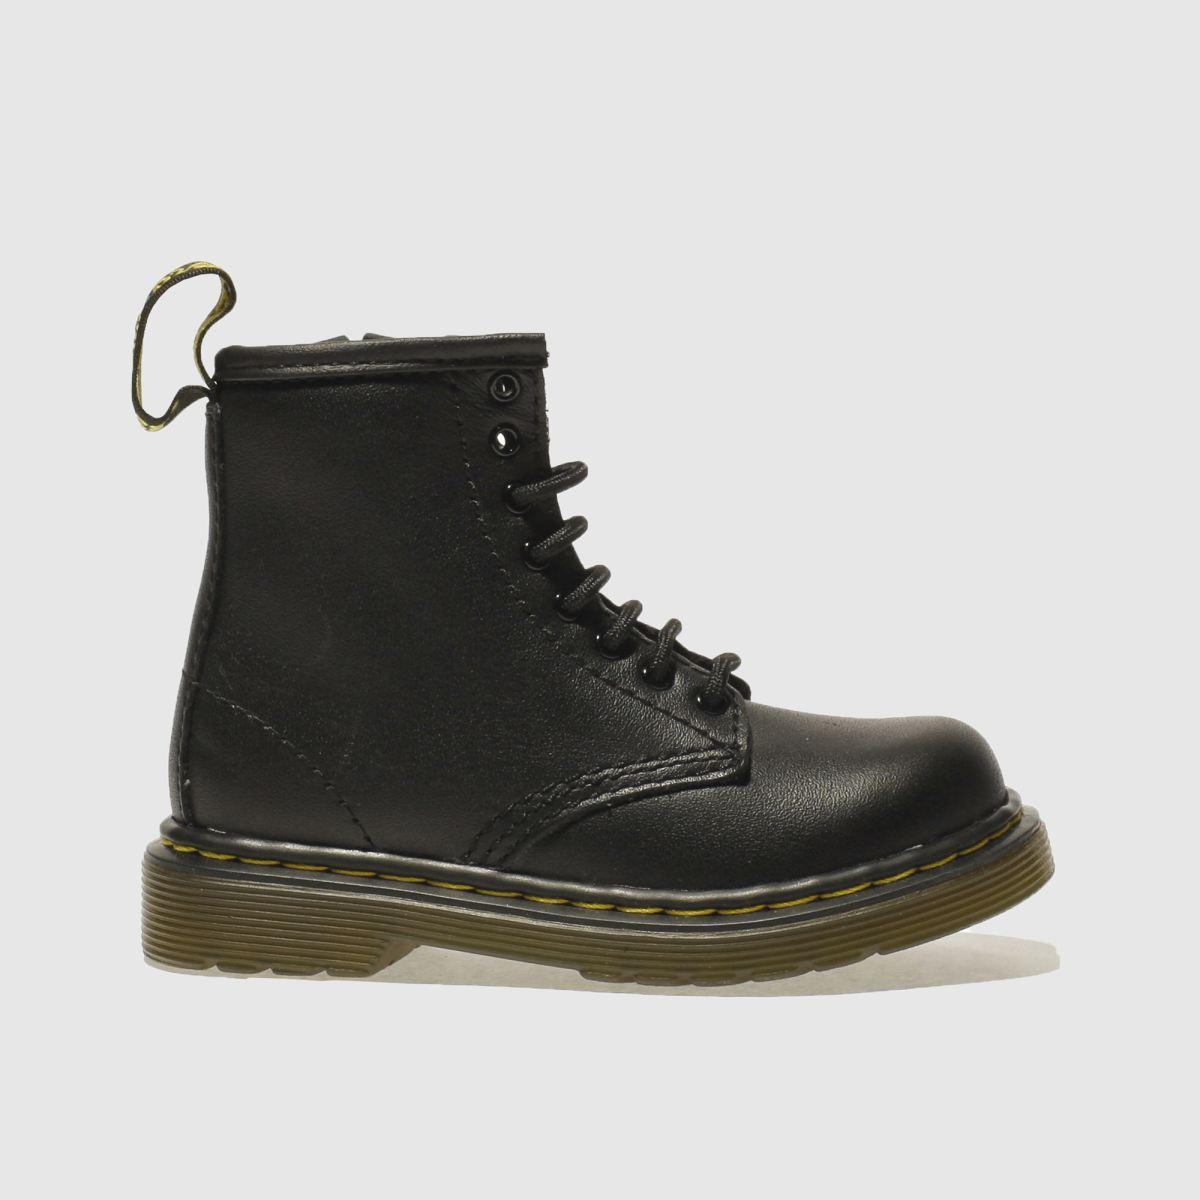 dr martens black brooklee boot Toddler Boots